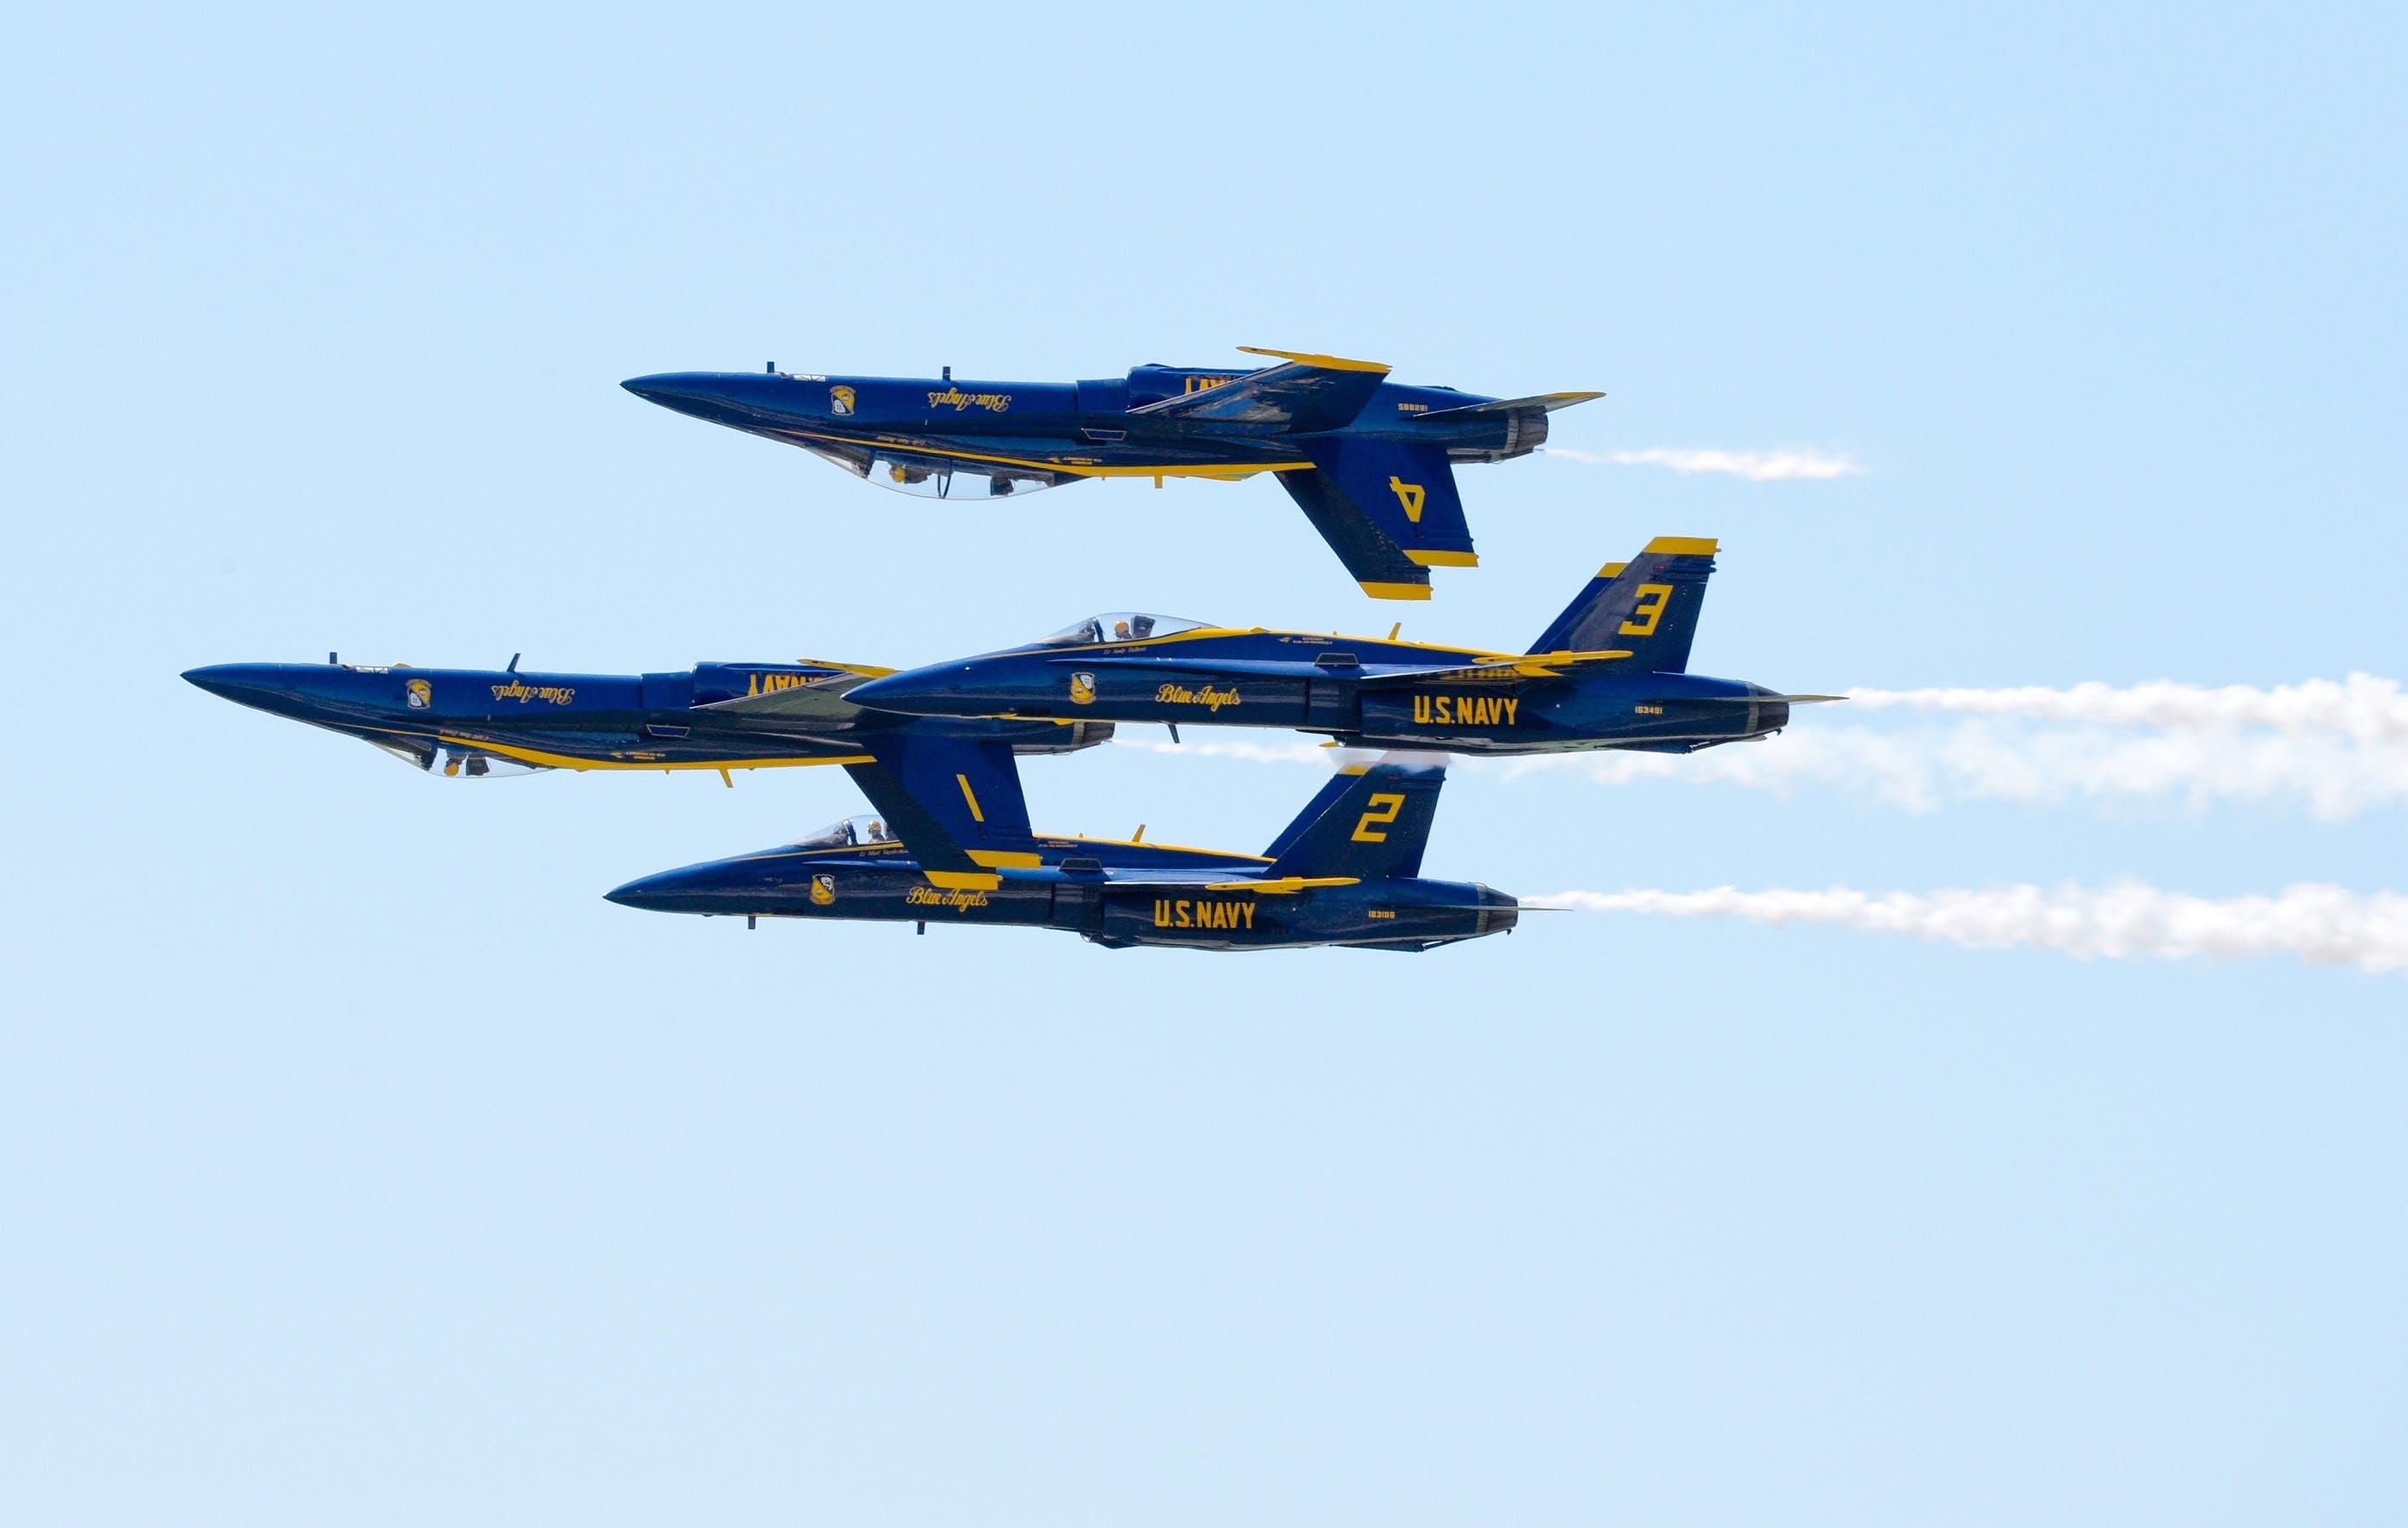 Free stock photo of aerobatics, aircraft, airplanes, blue angels